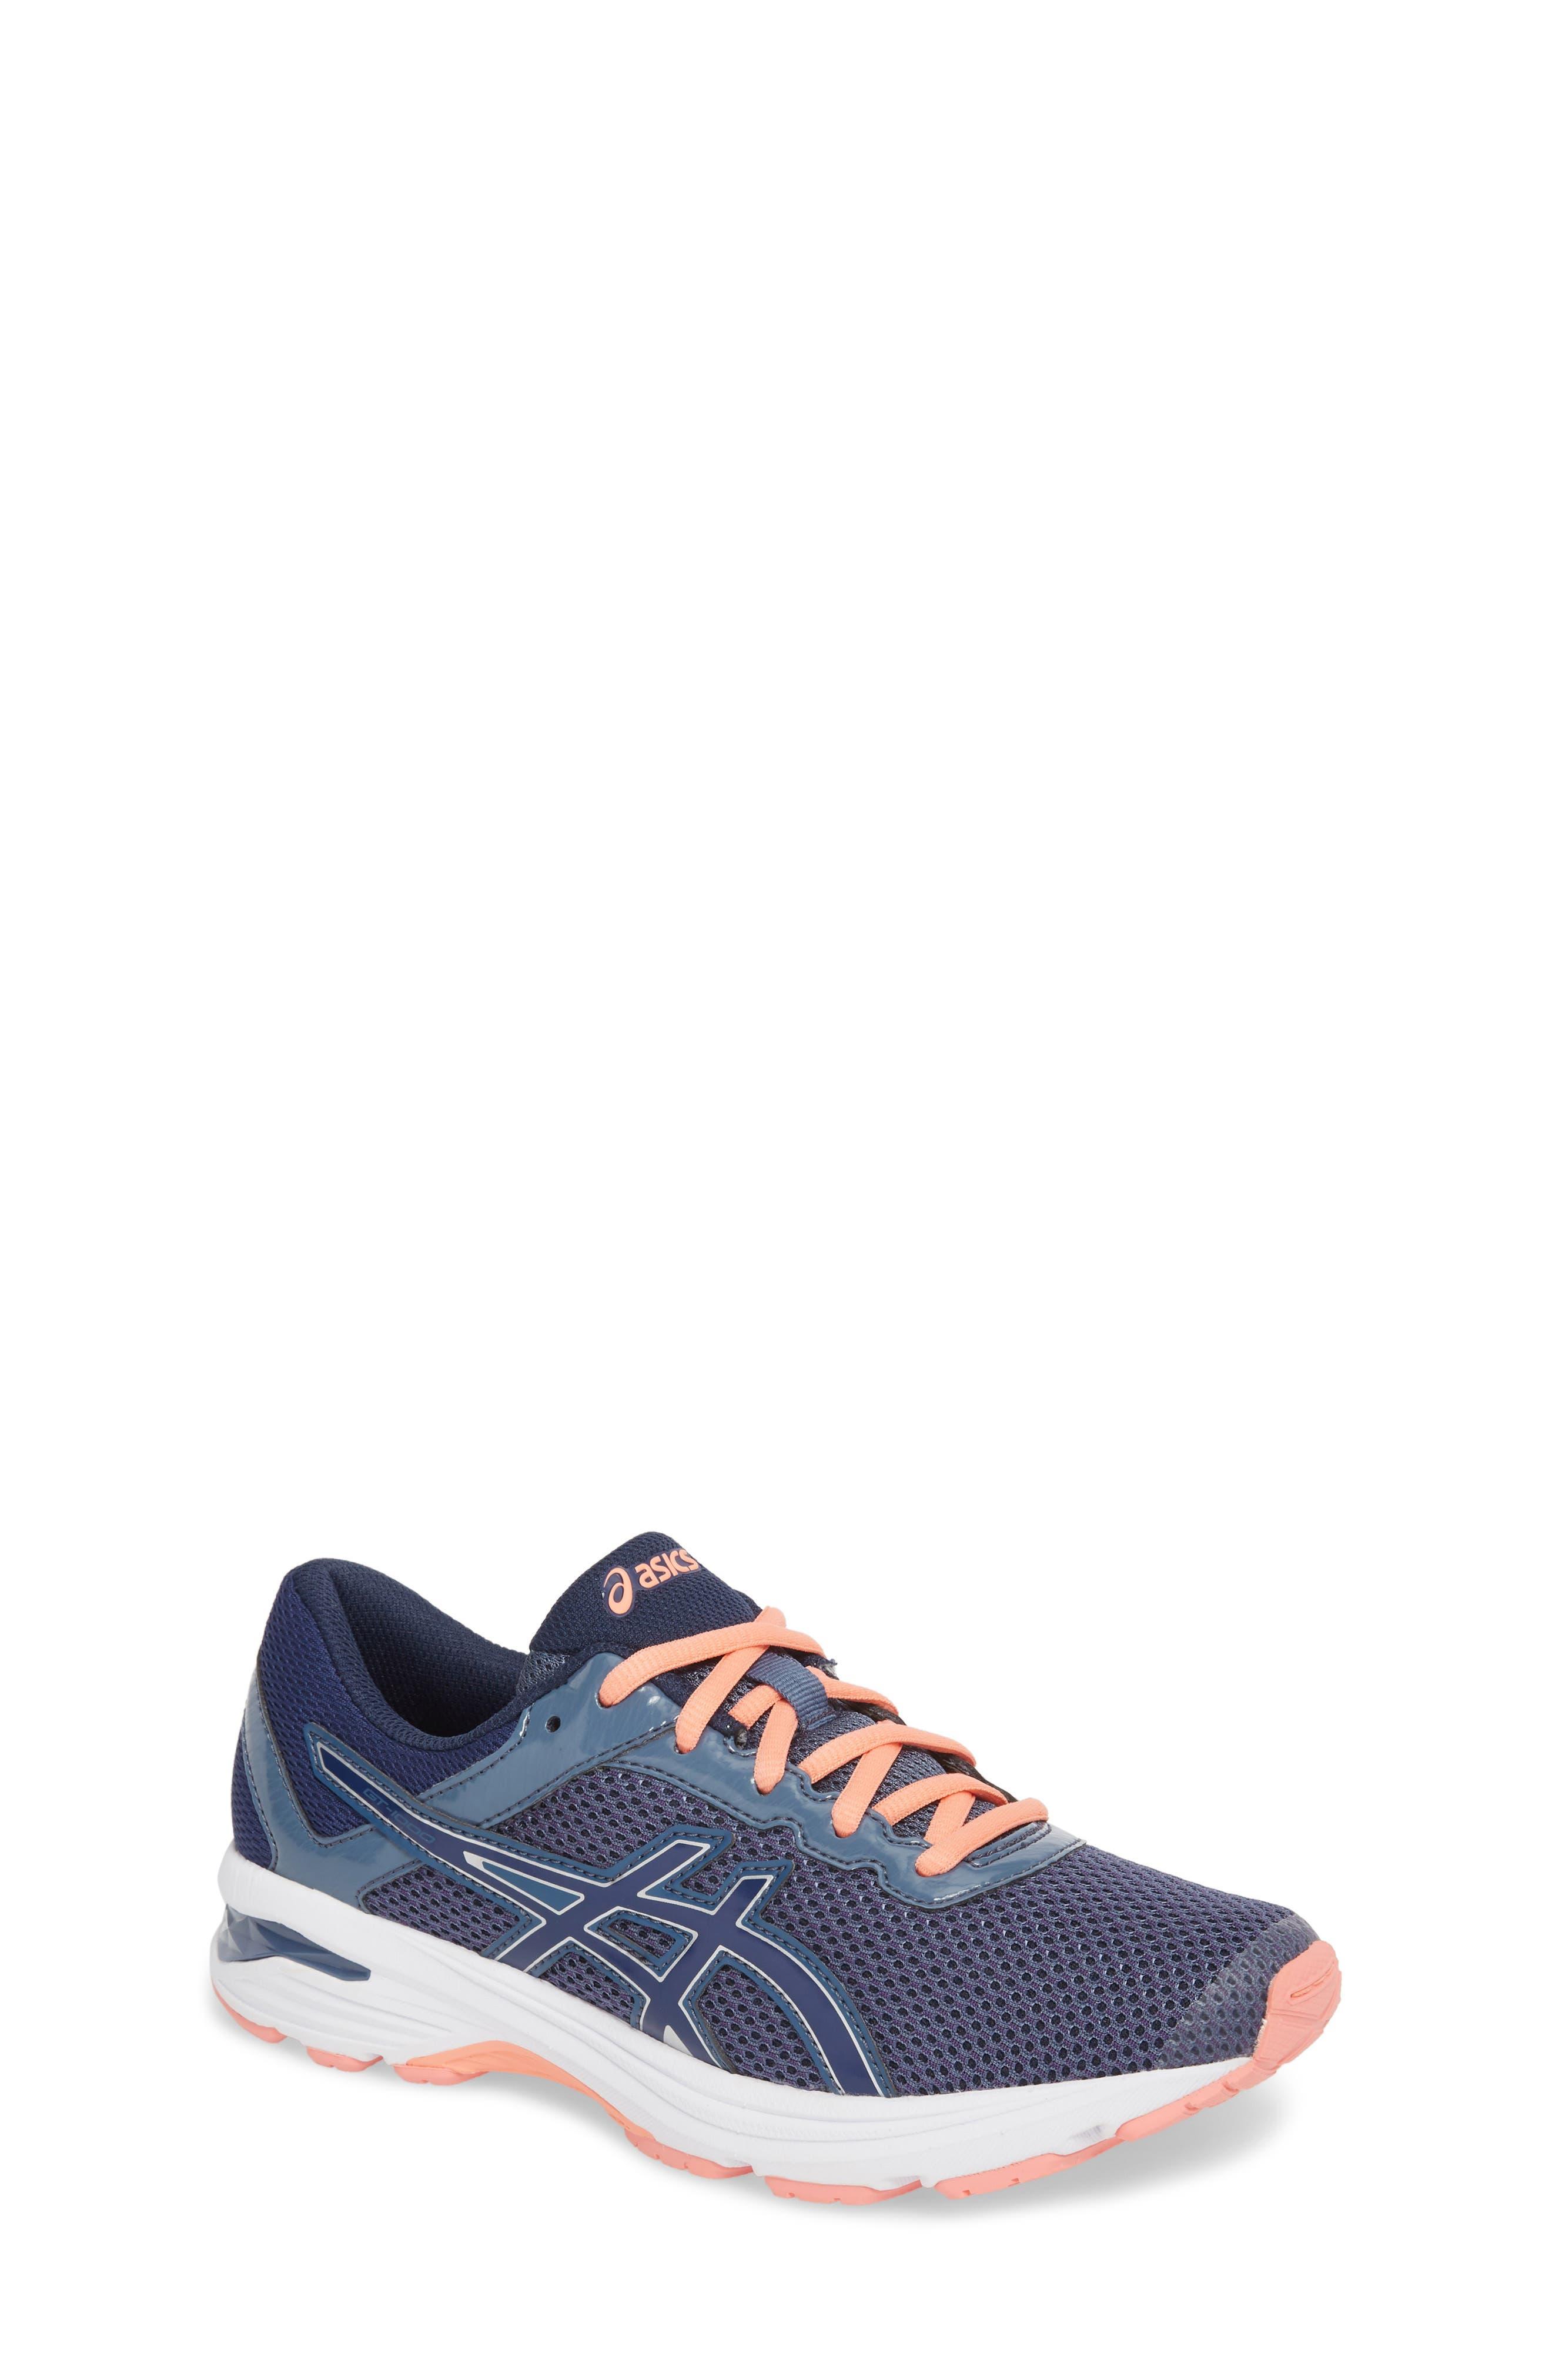 Asics GT-1000<sup>™</sup> 6 GS Sneaker,                             Main thumbnail 3, color,